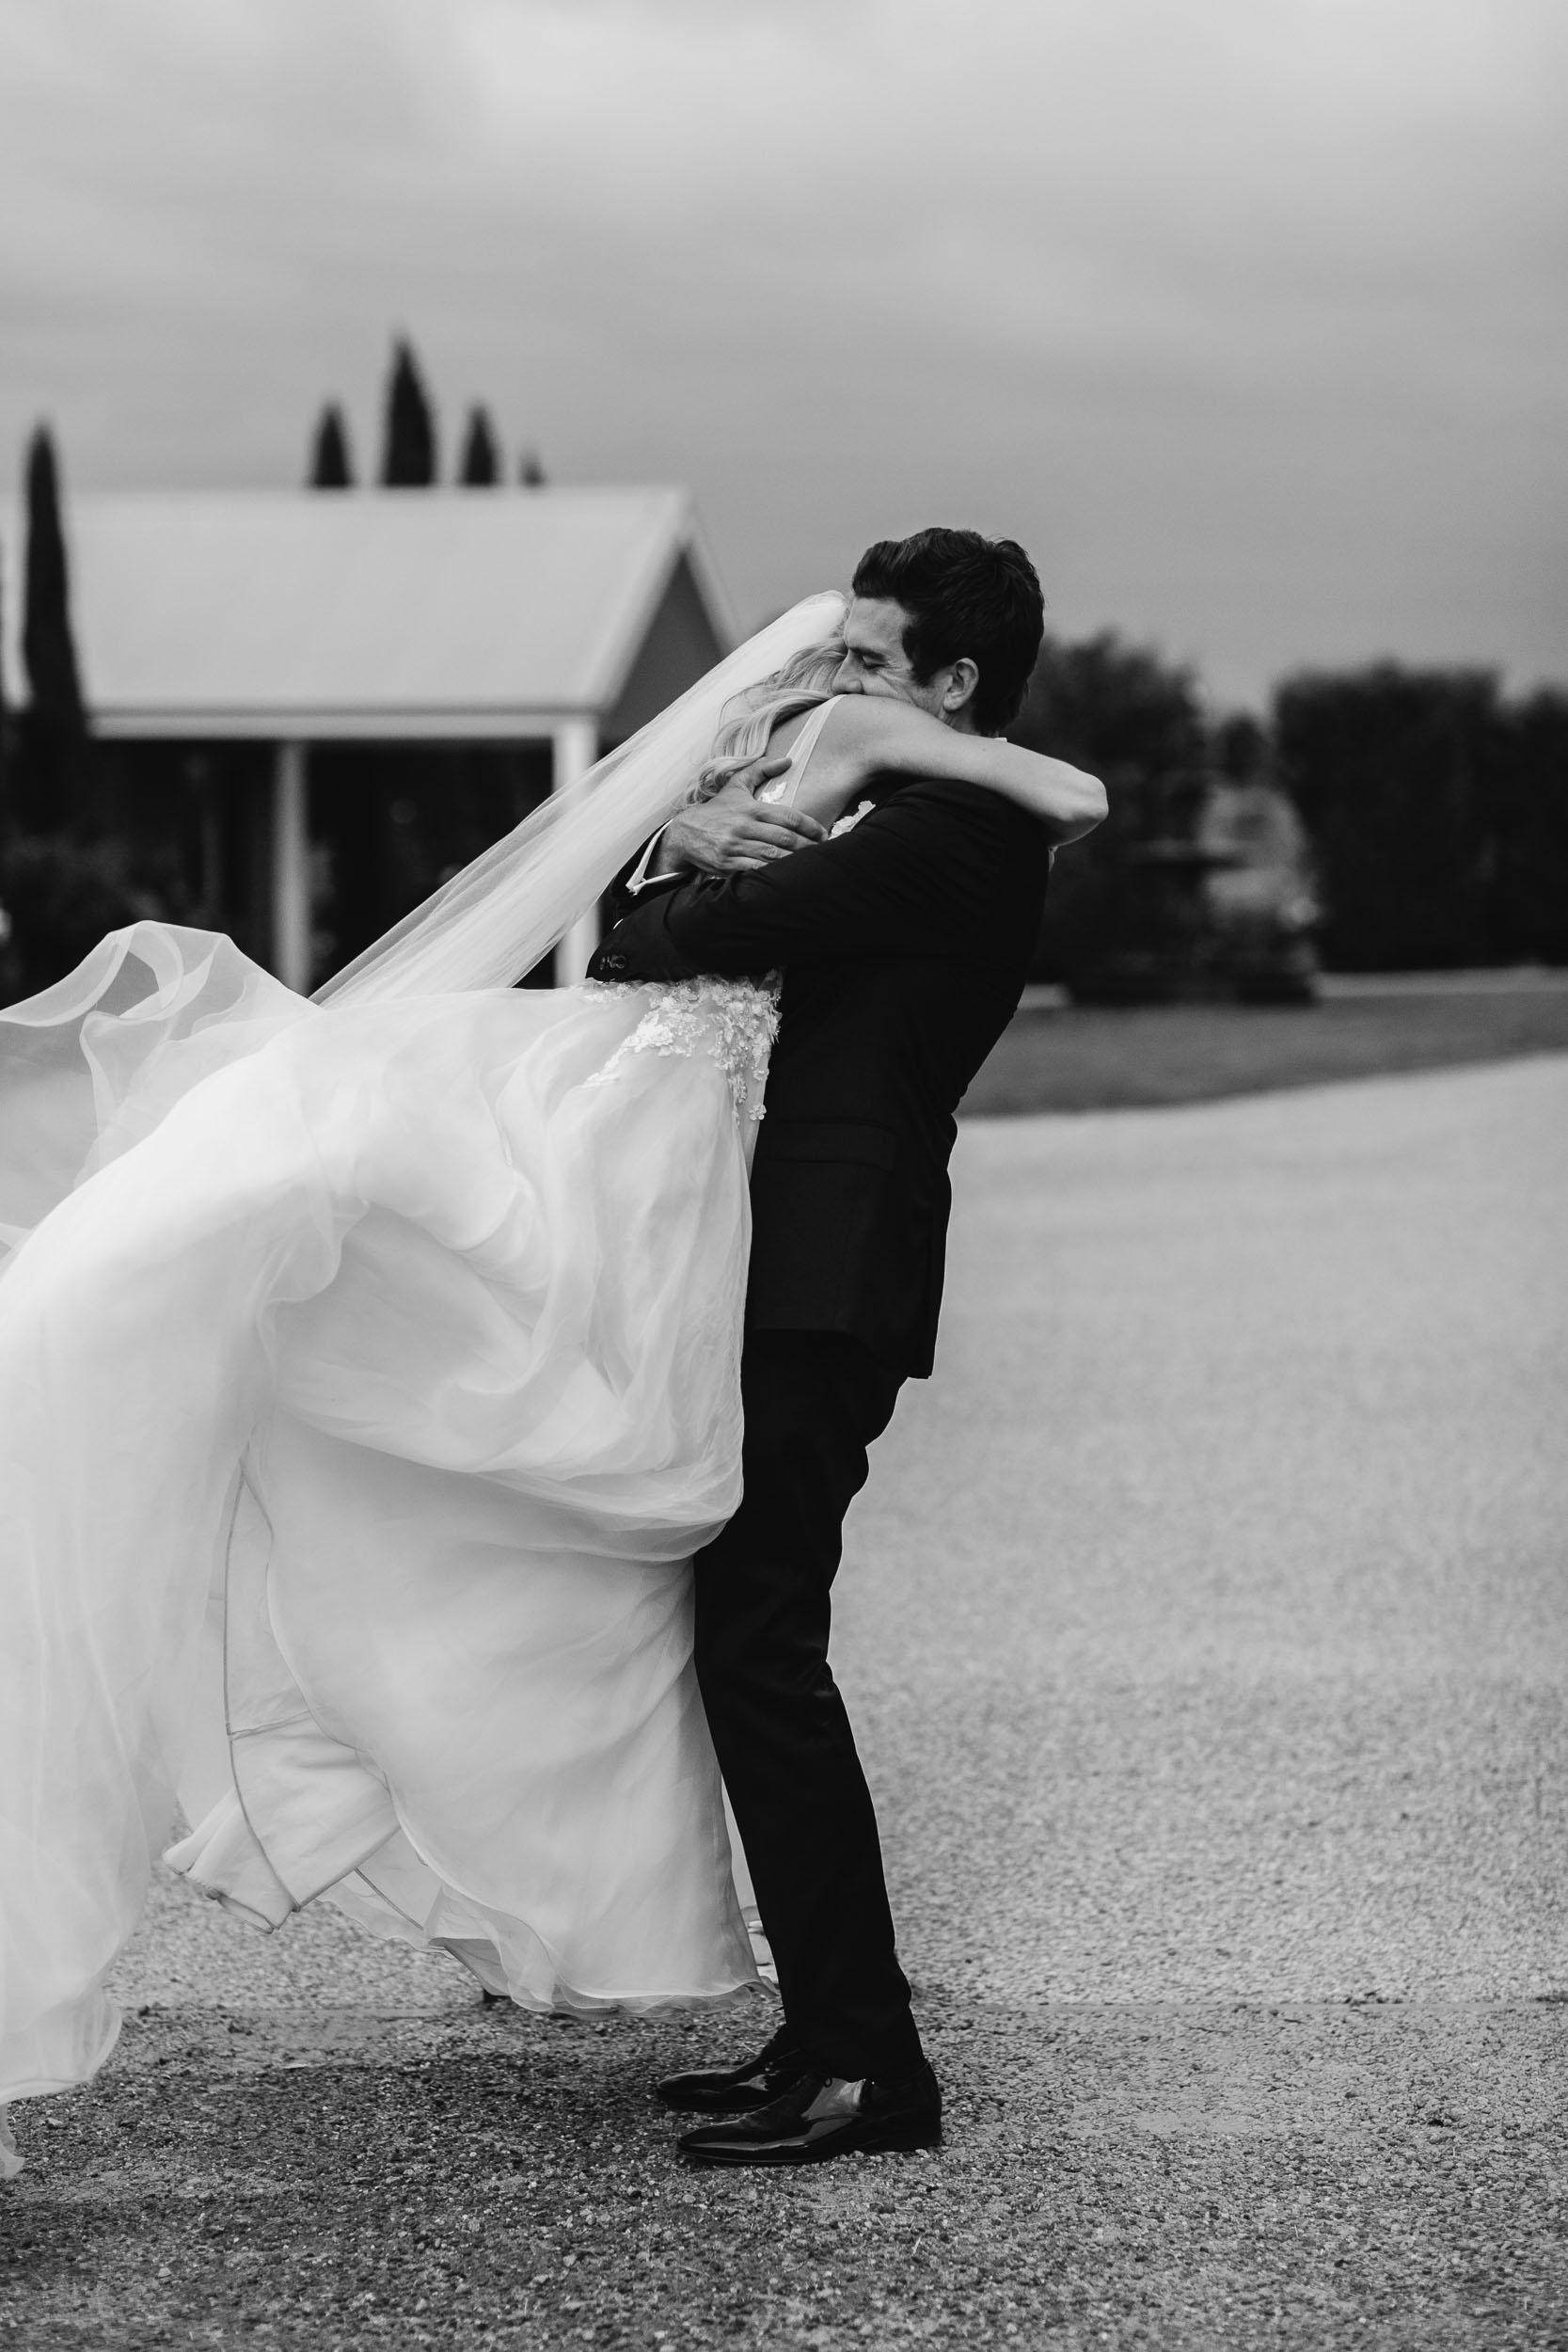 Kas-Richards-Mornington-Peninsula-Private-Property-Wedding-Marianna-Hardwick-Gown-703.jpg